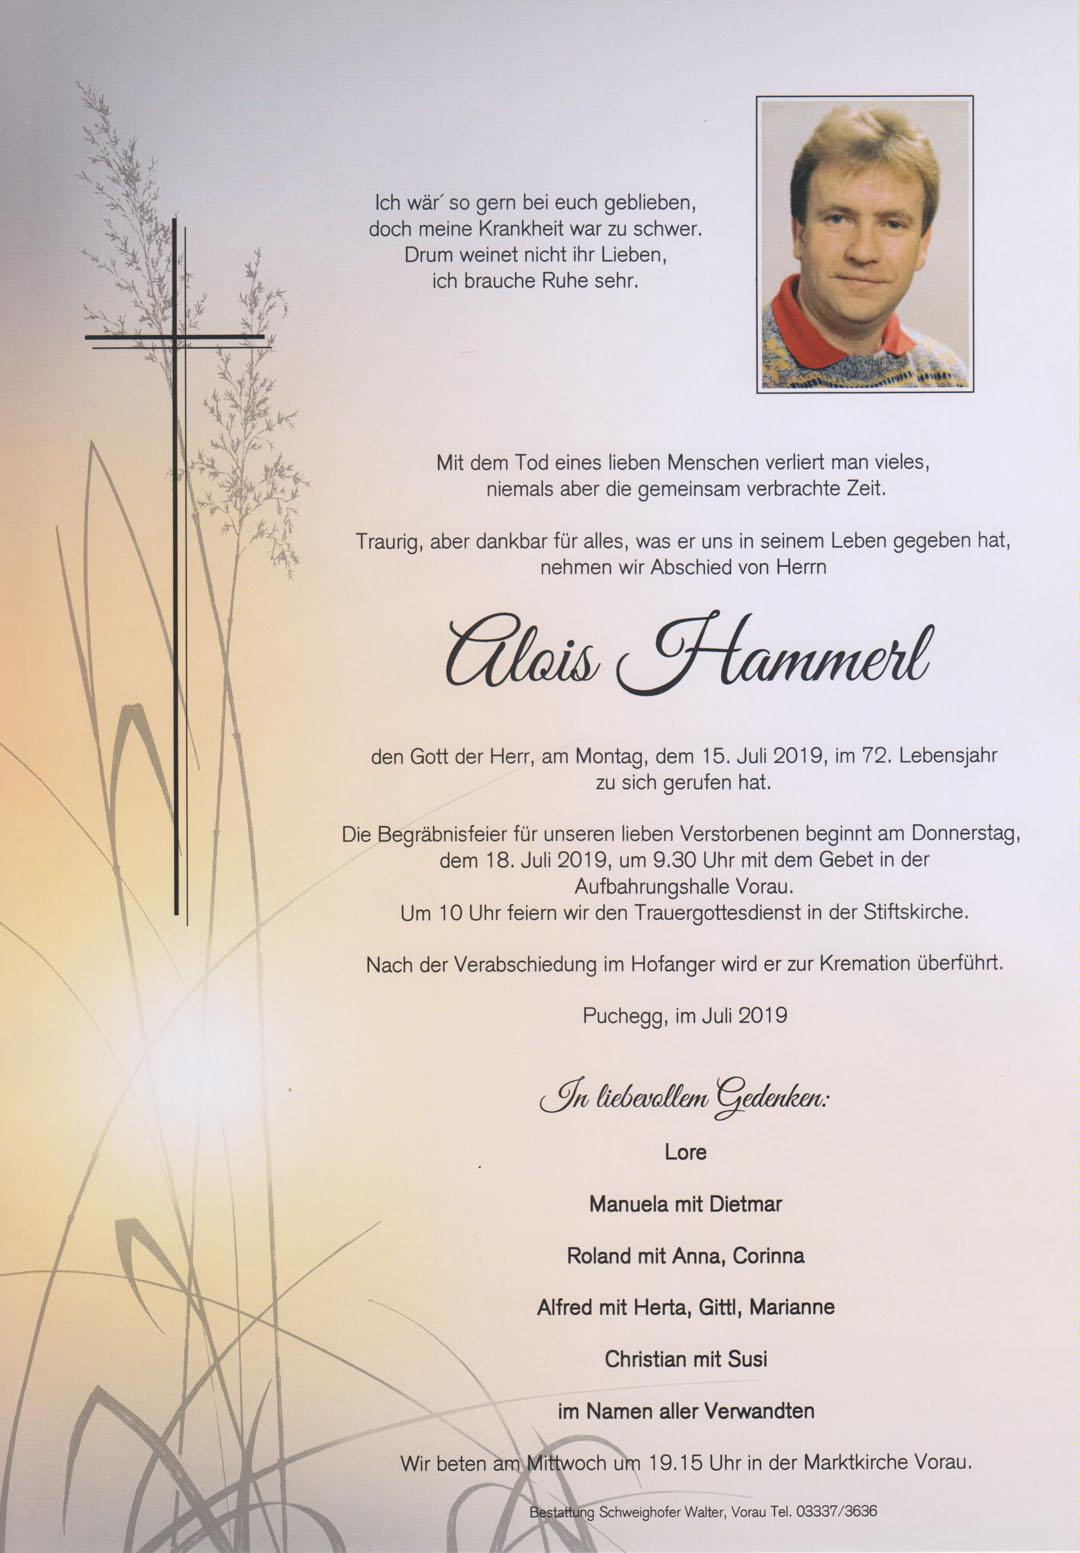 Alois Hammerl